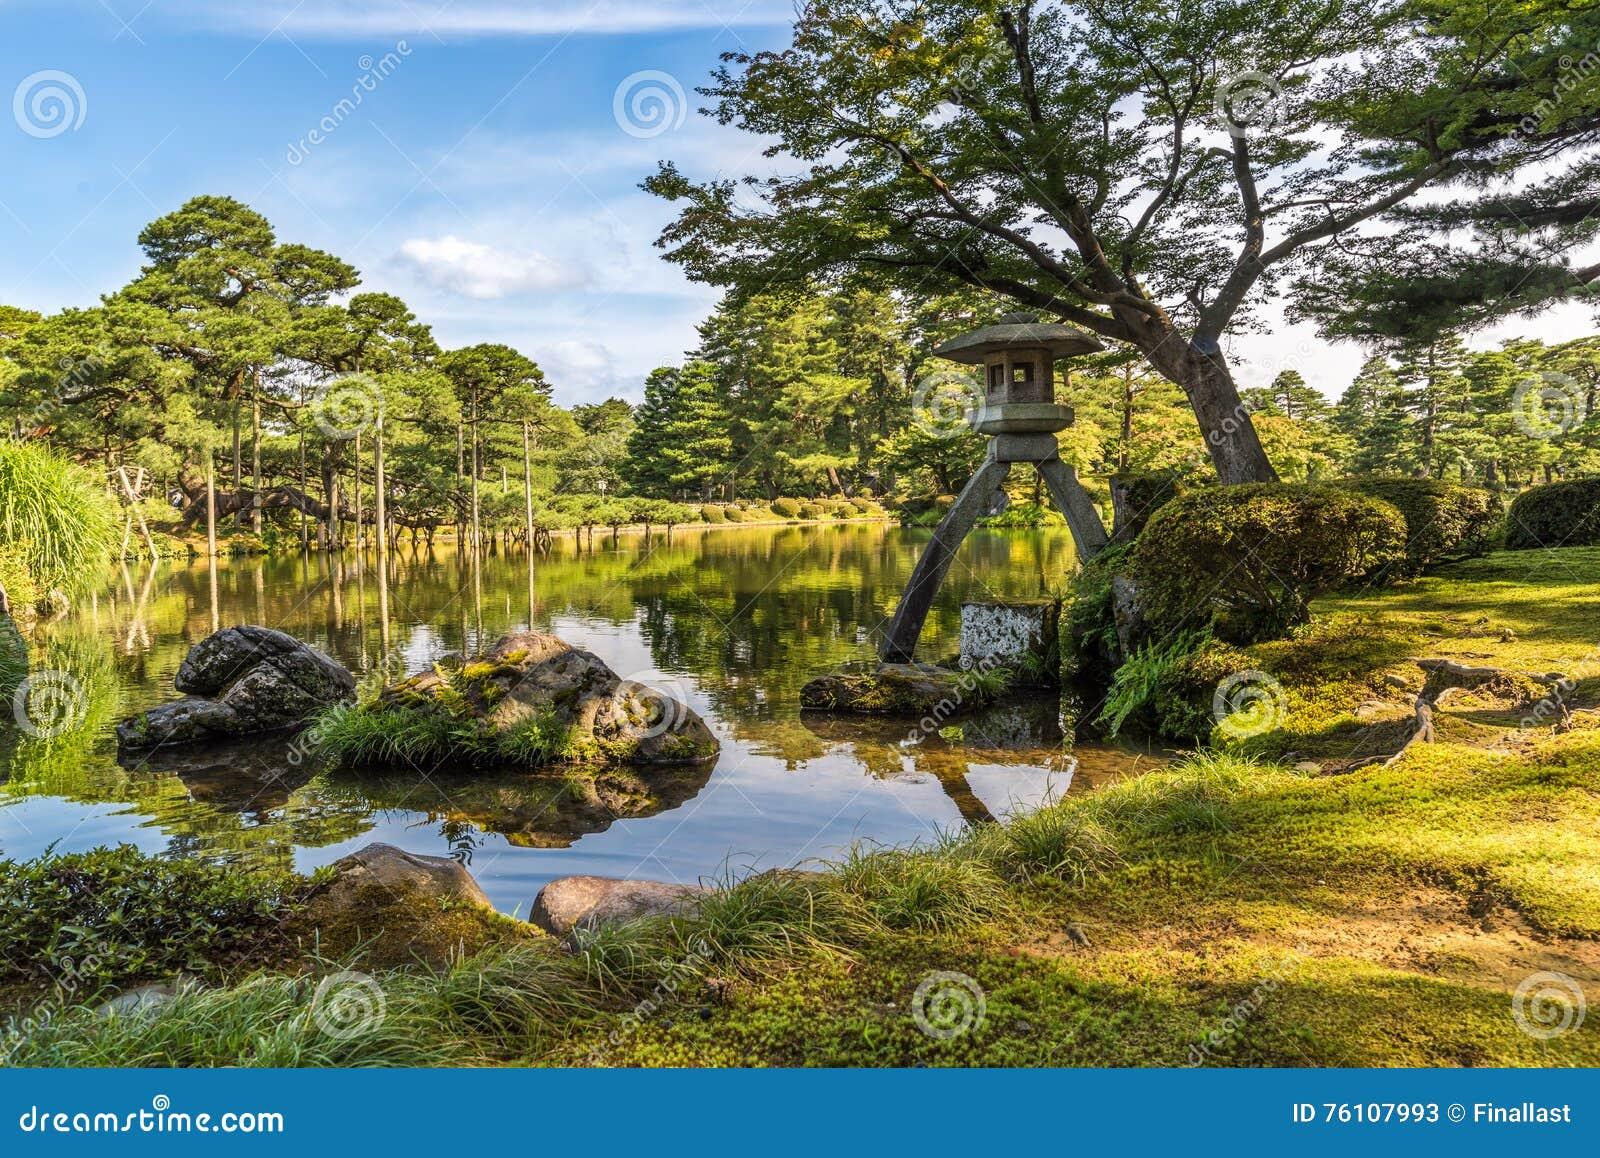 Kenroku En Garden Kanazawa Ishikawa Japan Stock Photo